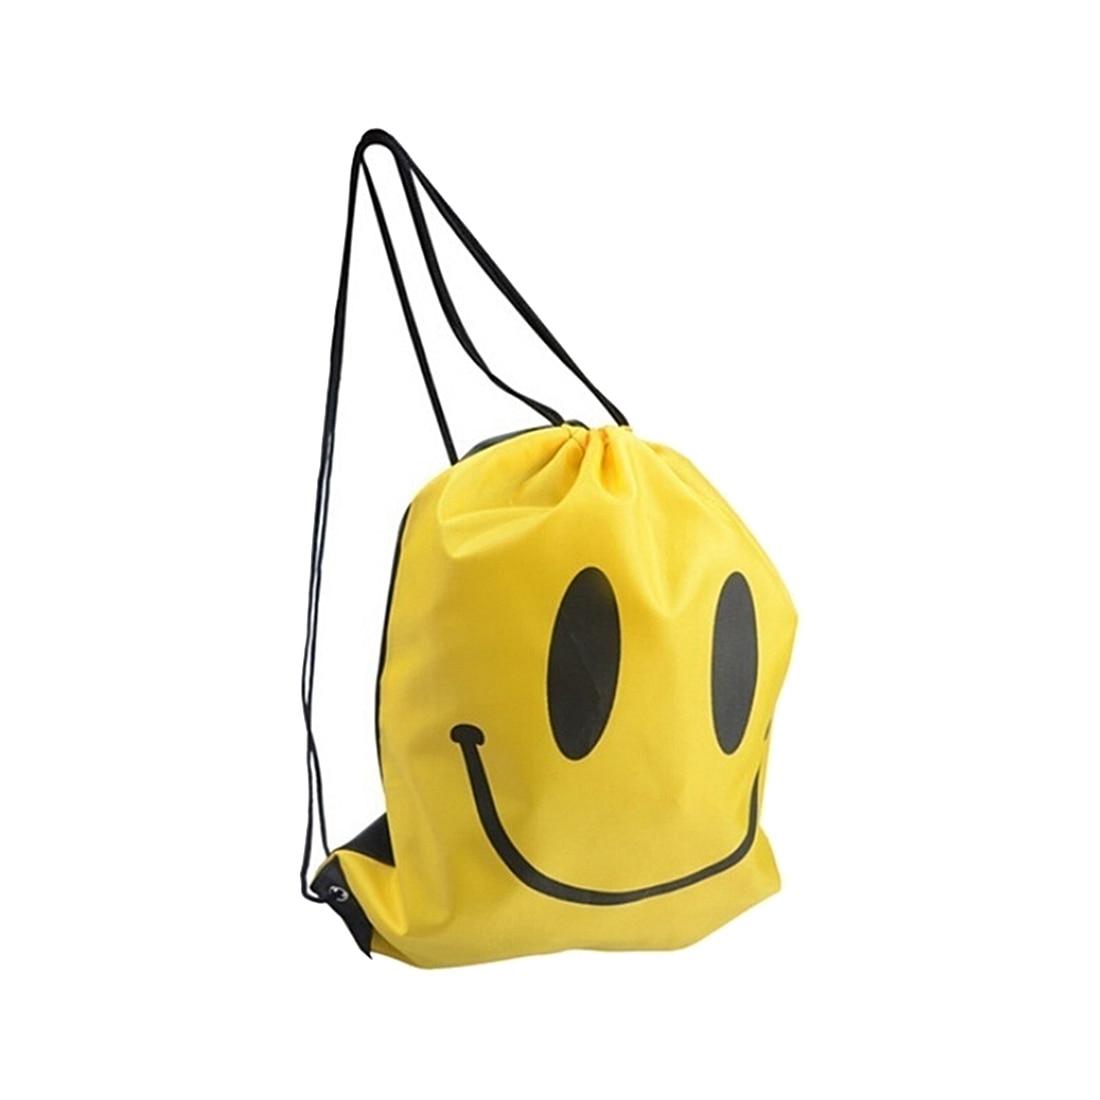 ABDB Smile  Backpack Drawstring Waterproof Bag